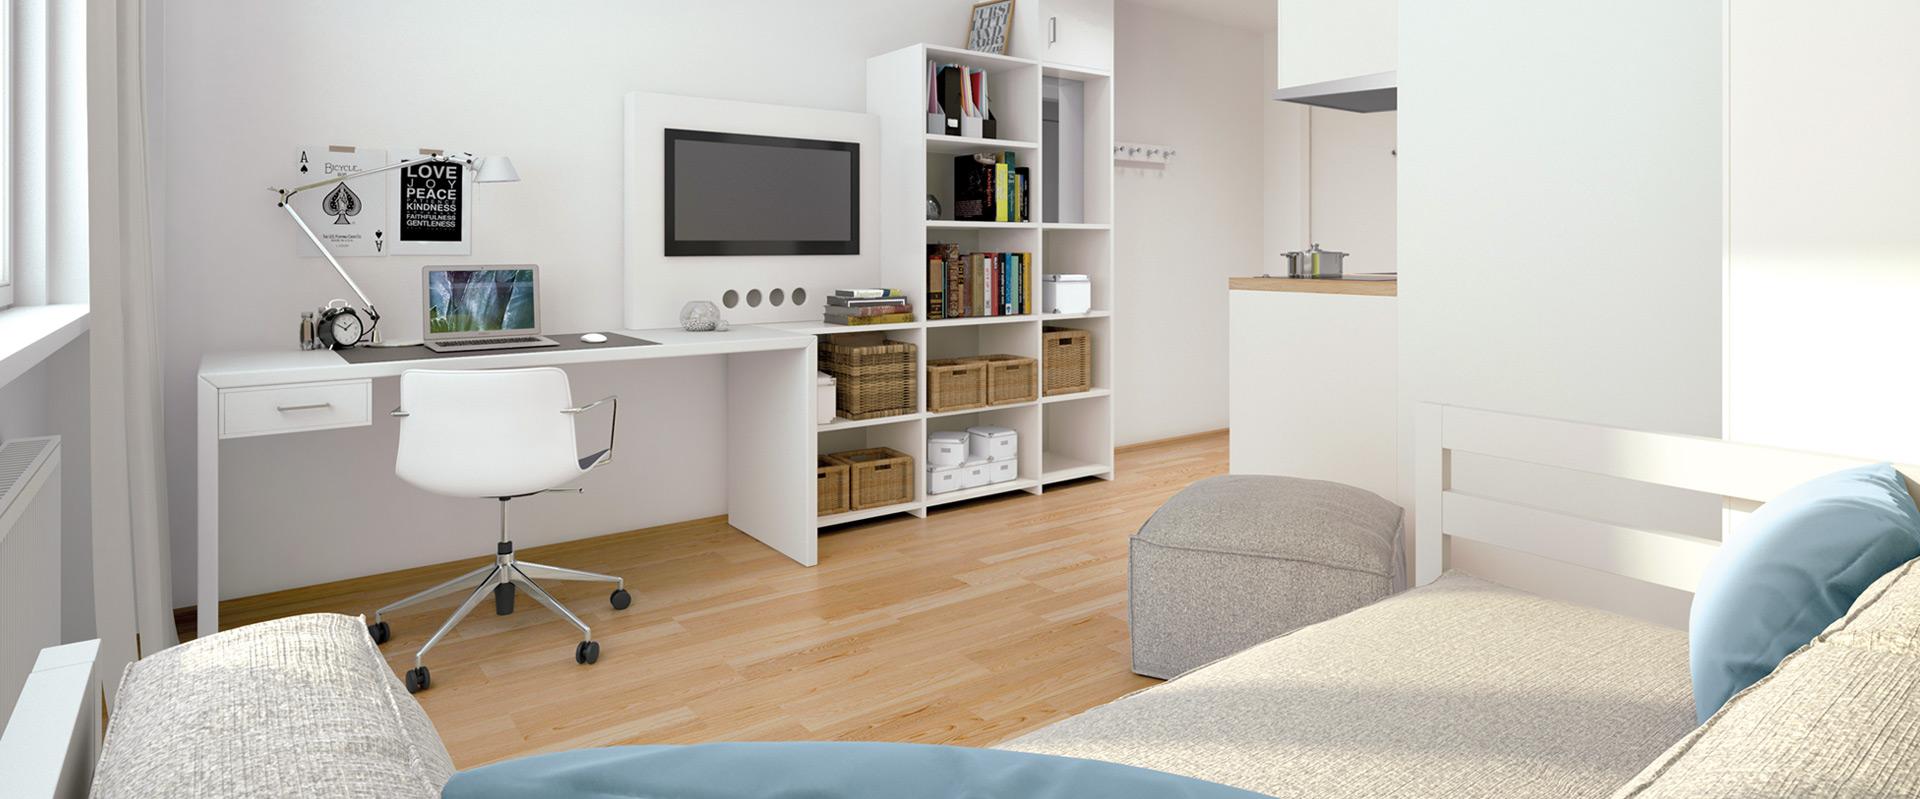 vivo phoenix. Black Bedroom Furniture Sets. Home Design Ideas